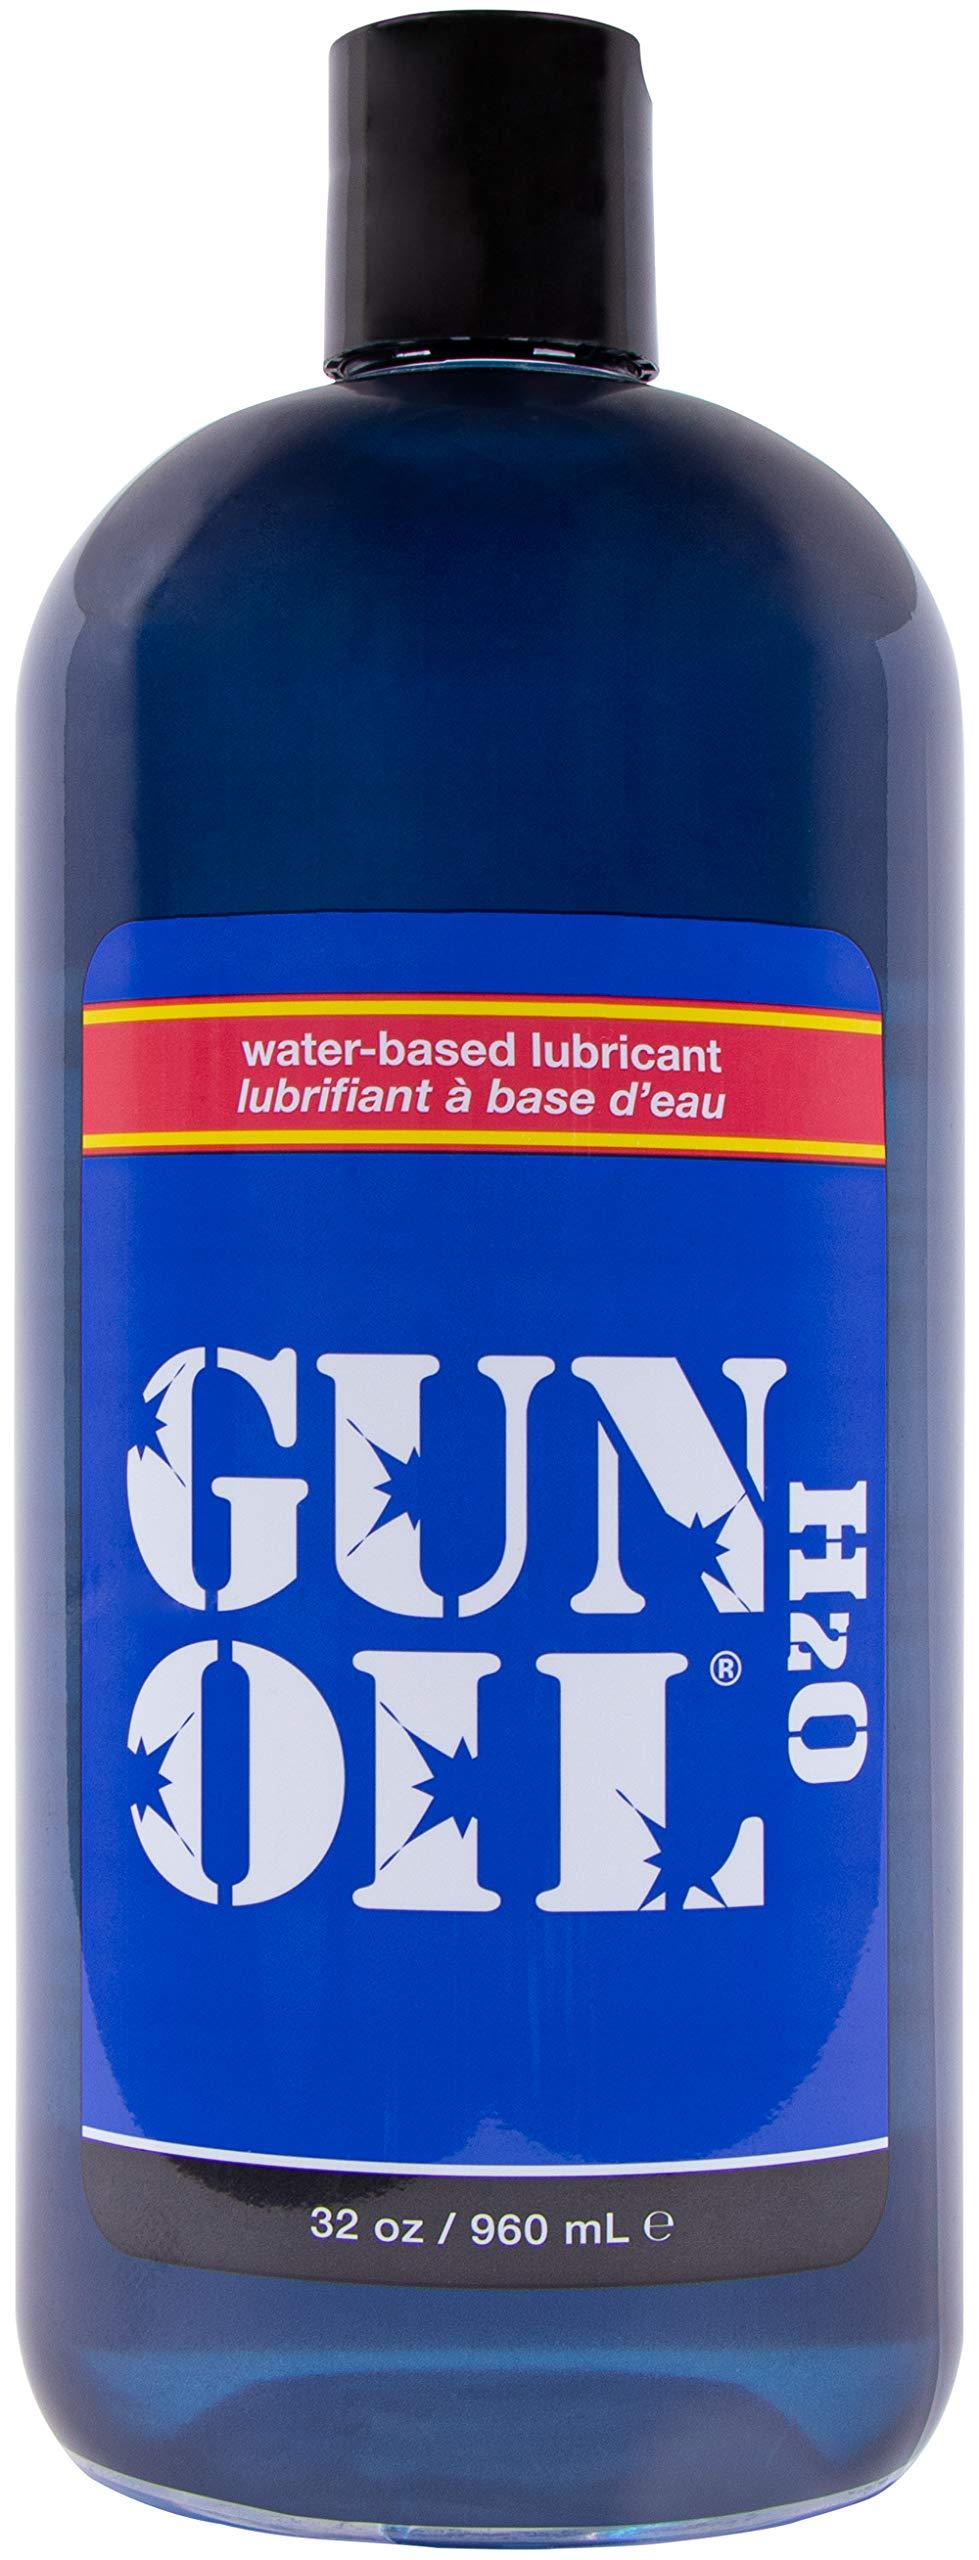 GUN OIL - H2O Water-Based Lubricant (32 Fluid Ounce - 1000 Milliliter) by Gun Oil